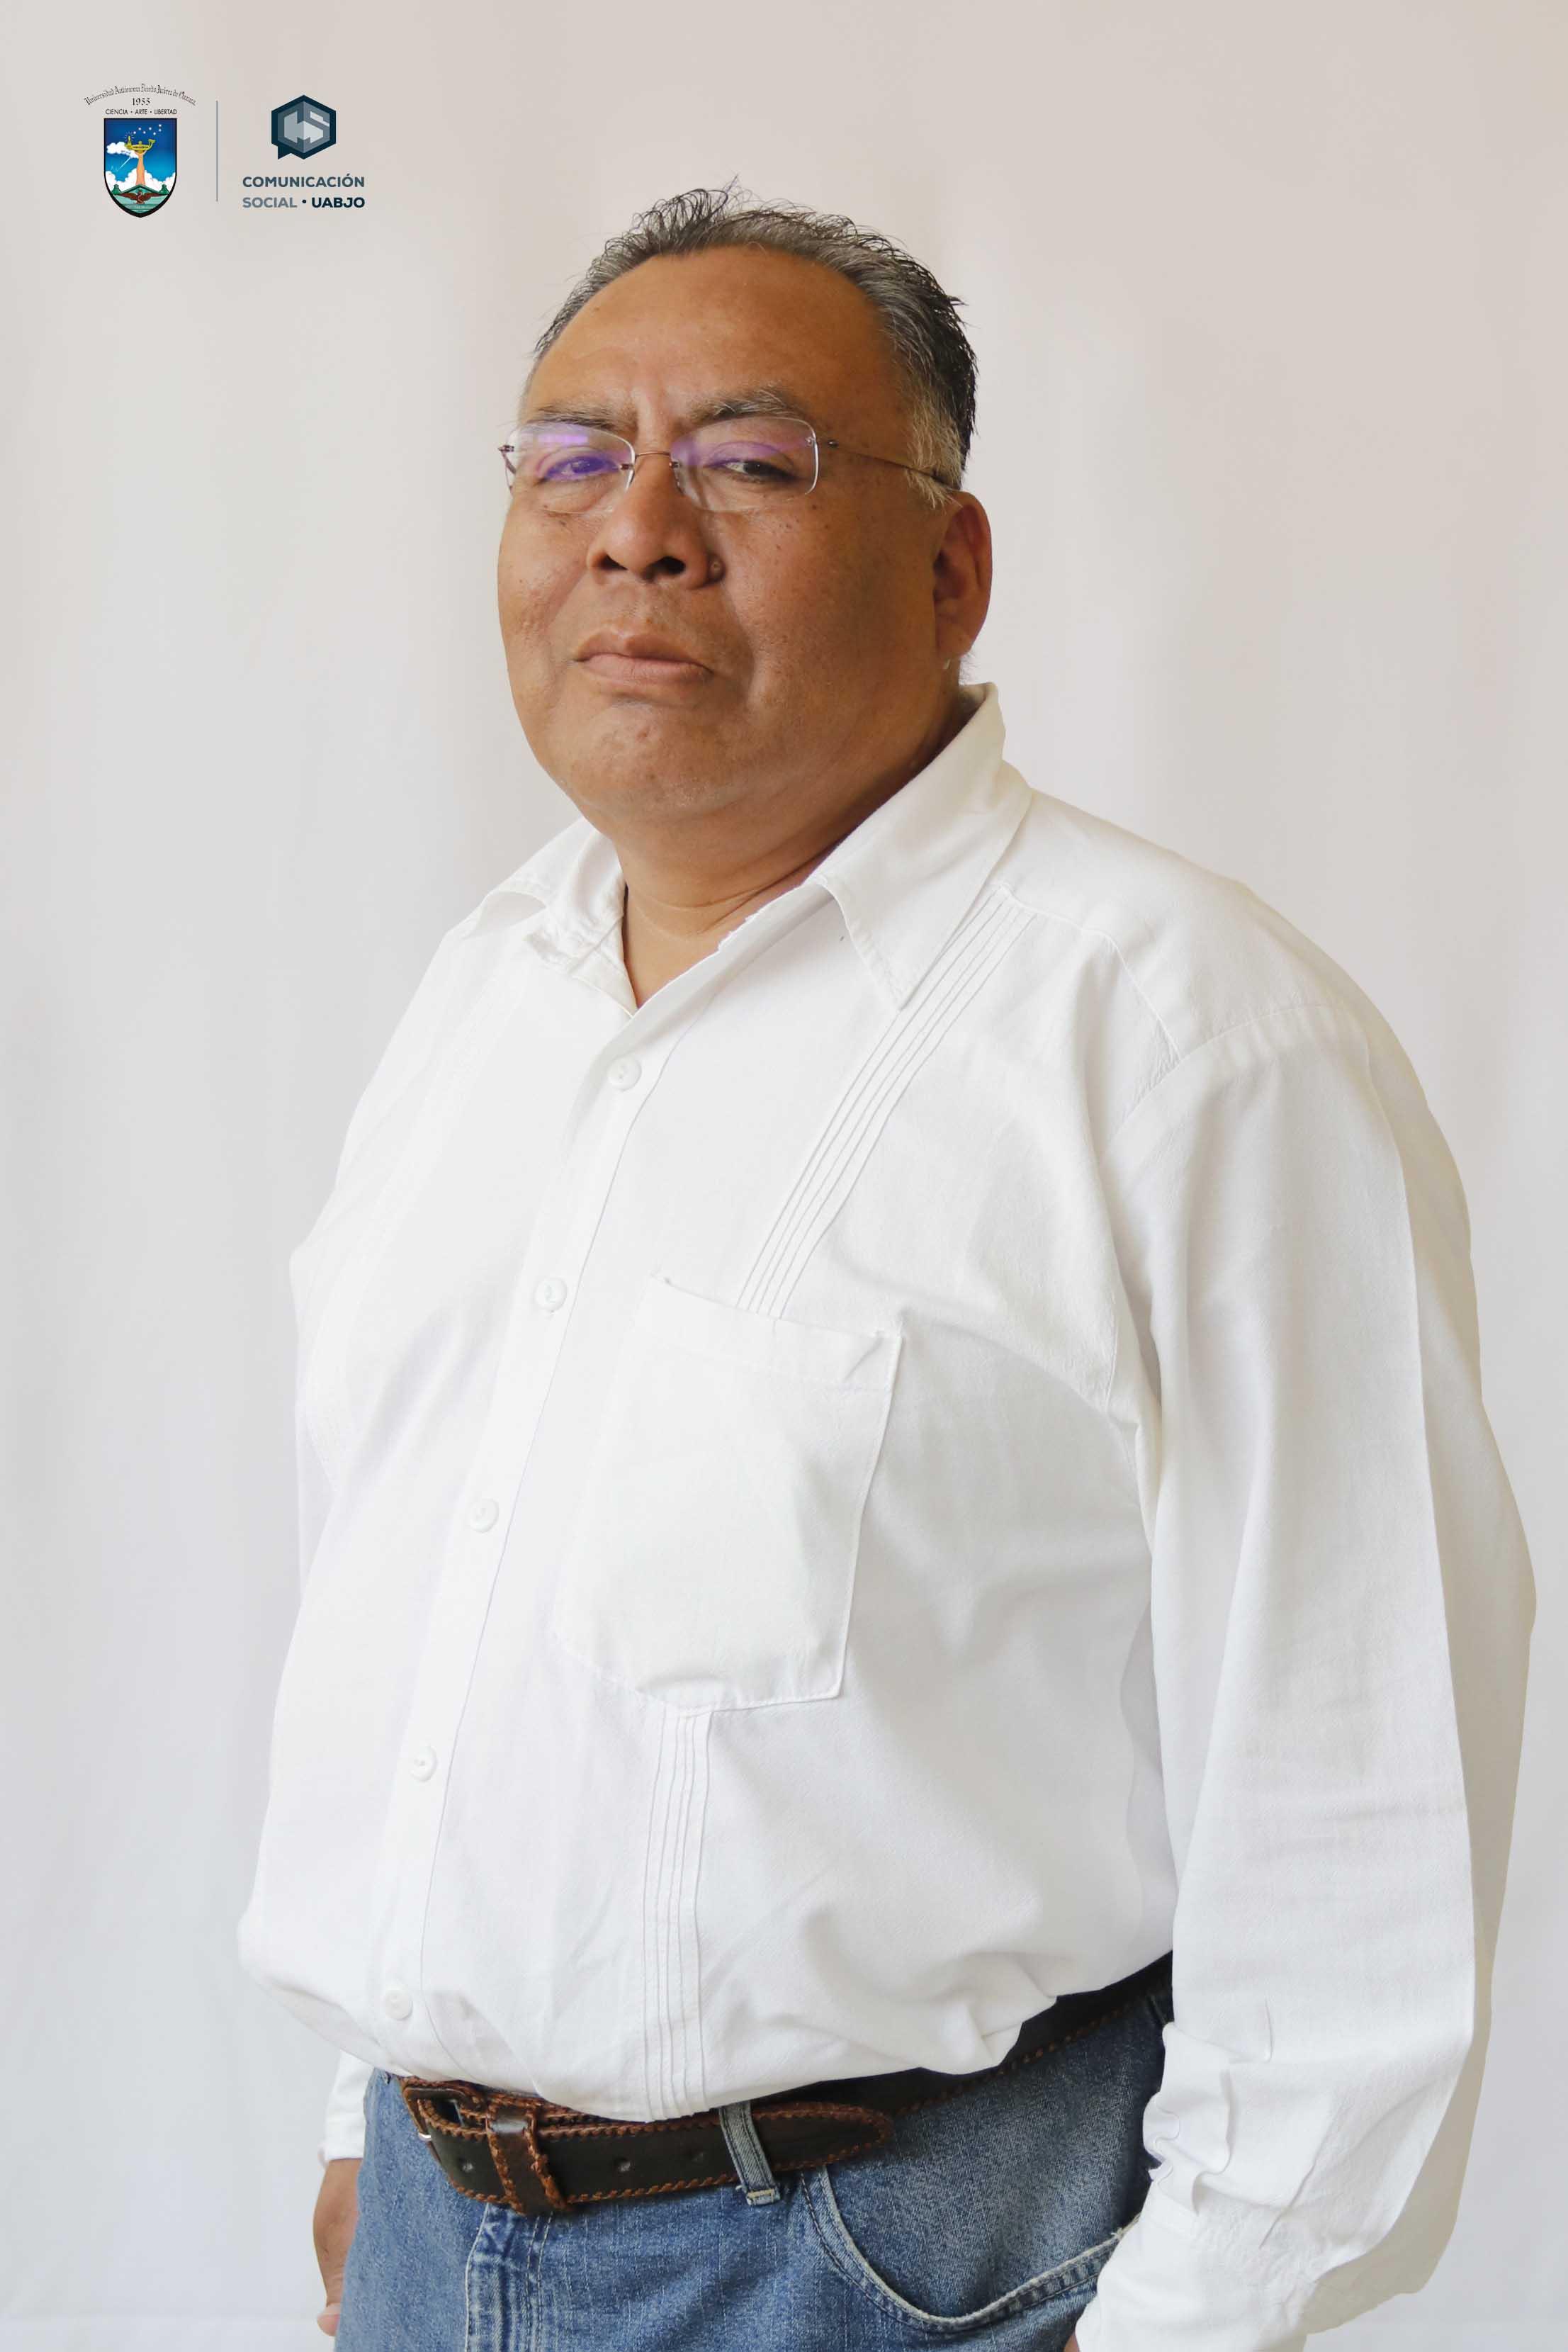 SECRETARIO DE PLANEACION